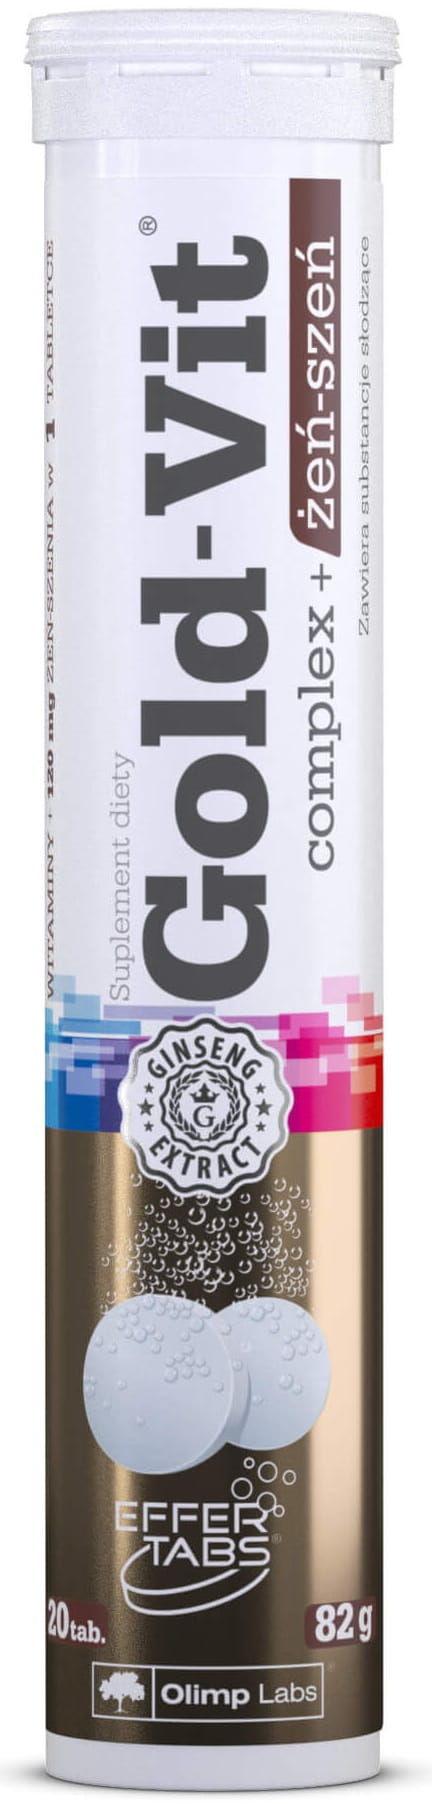 Gold-Vit  Complex+Żeń-szeń Smak Pomarańczowy Suplement Diety 20 Tabletek Musujących - Olimp Labs